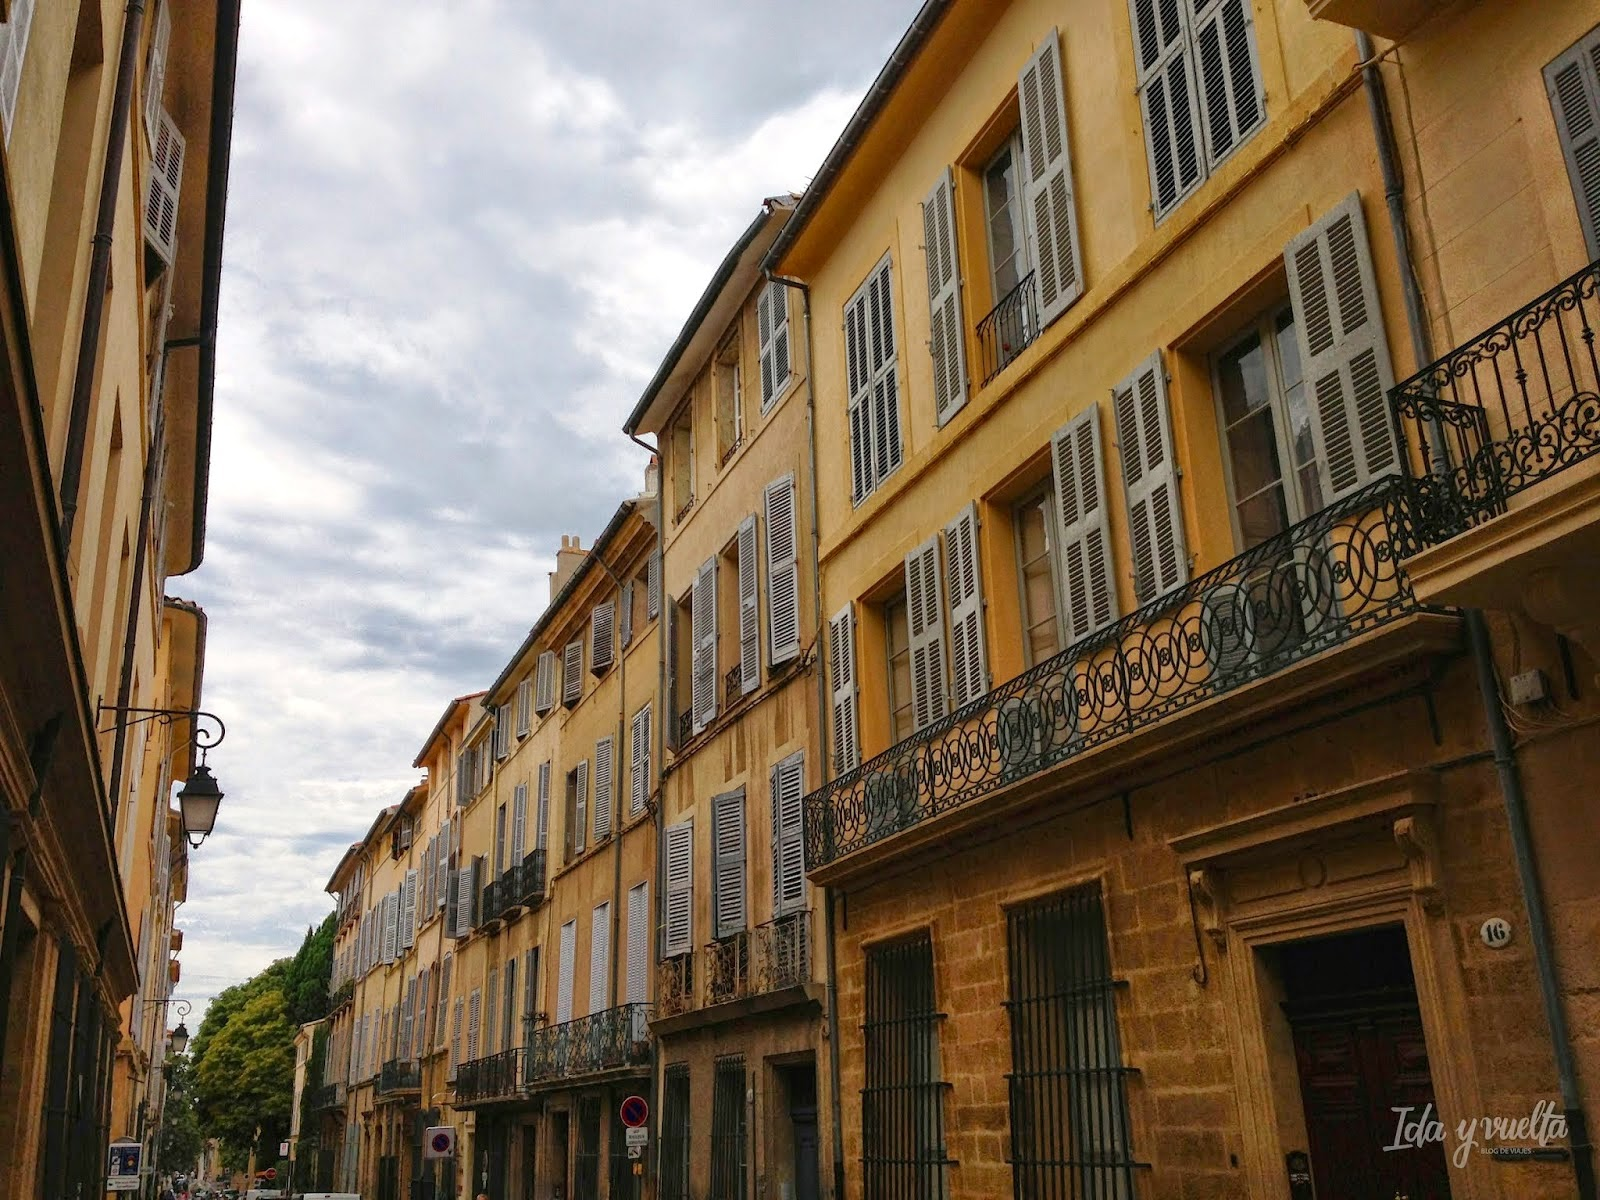 Calle de Aix-en-Provence